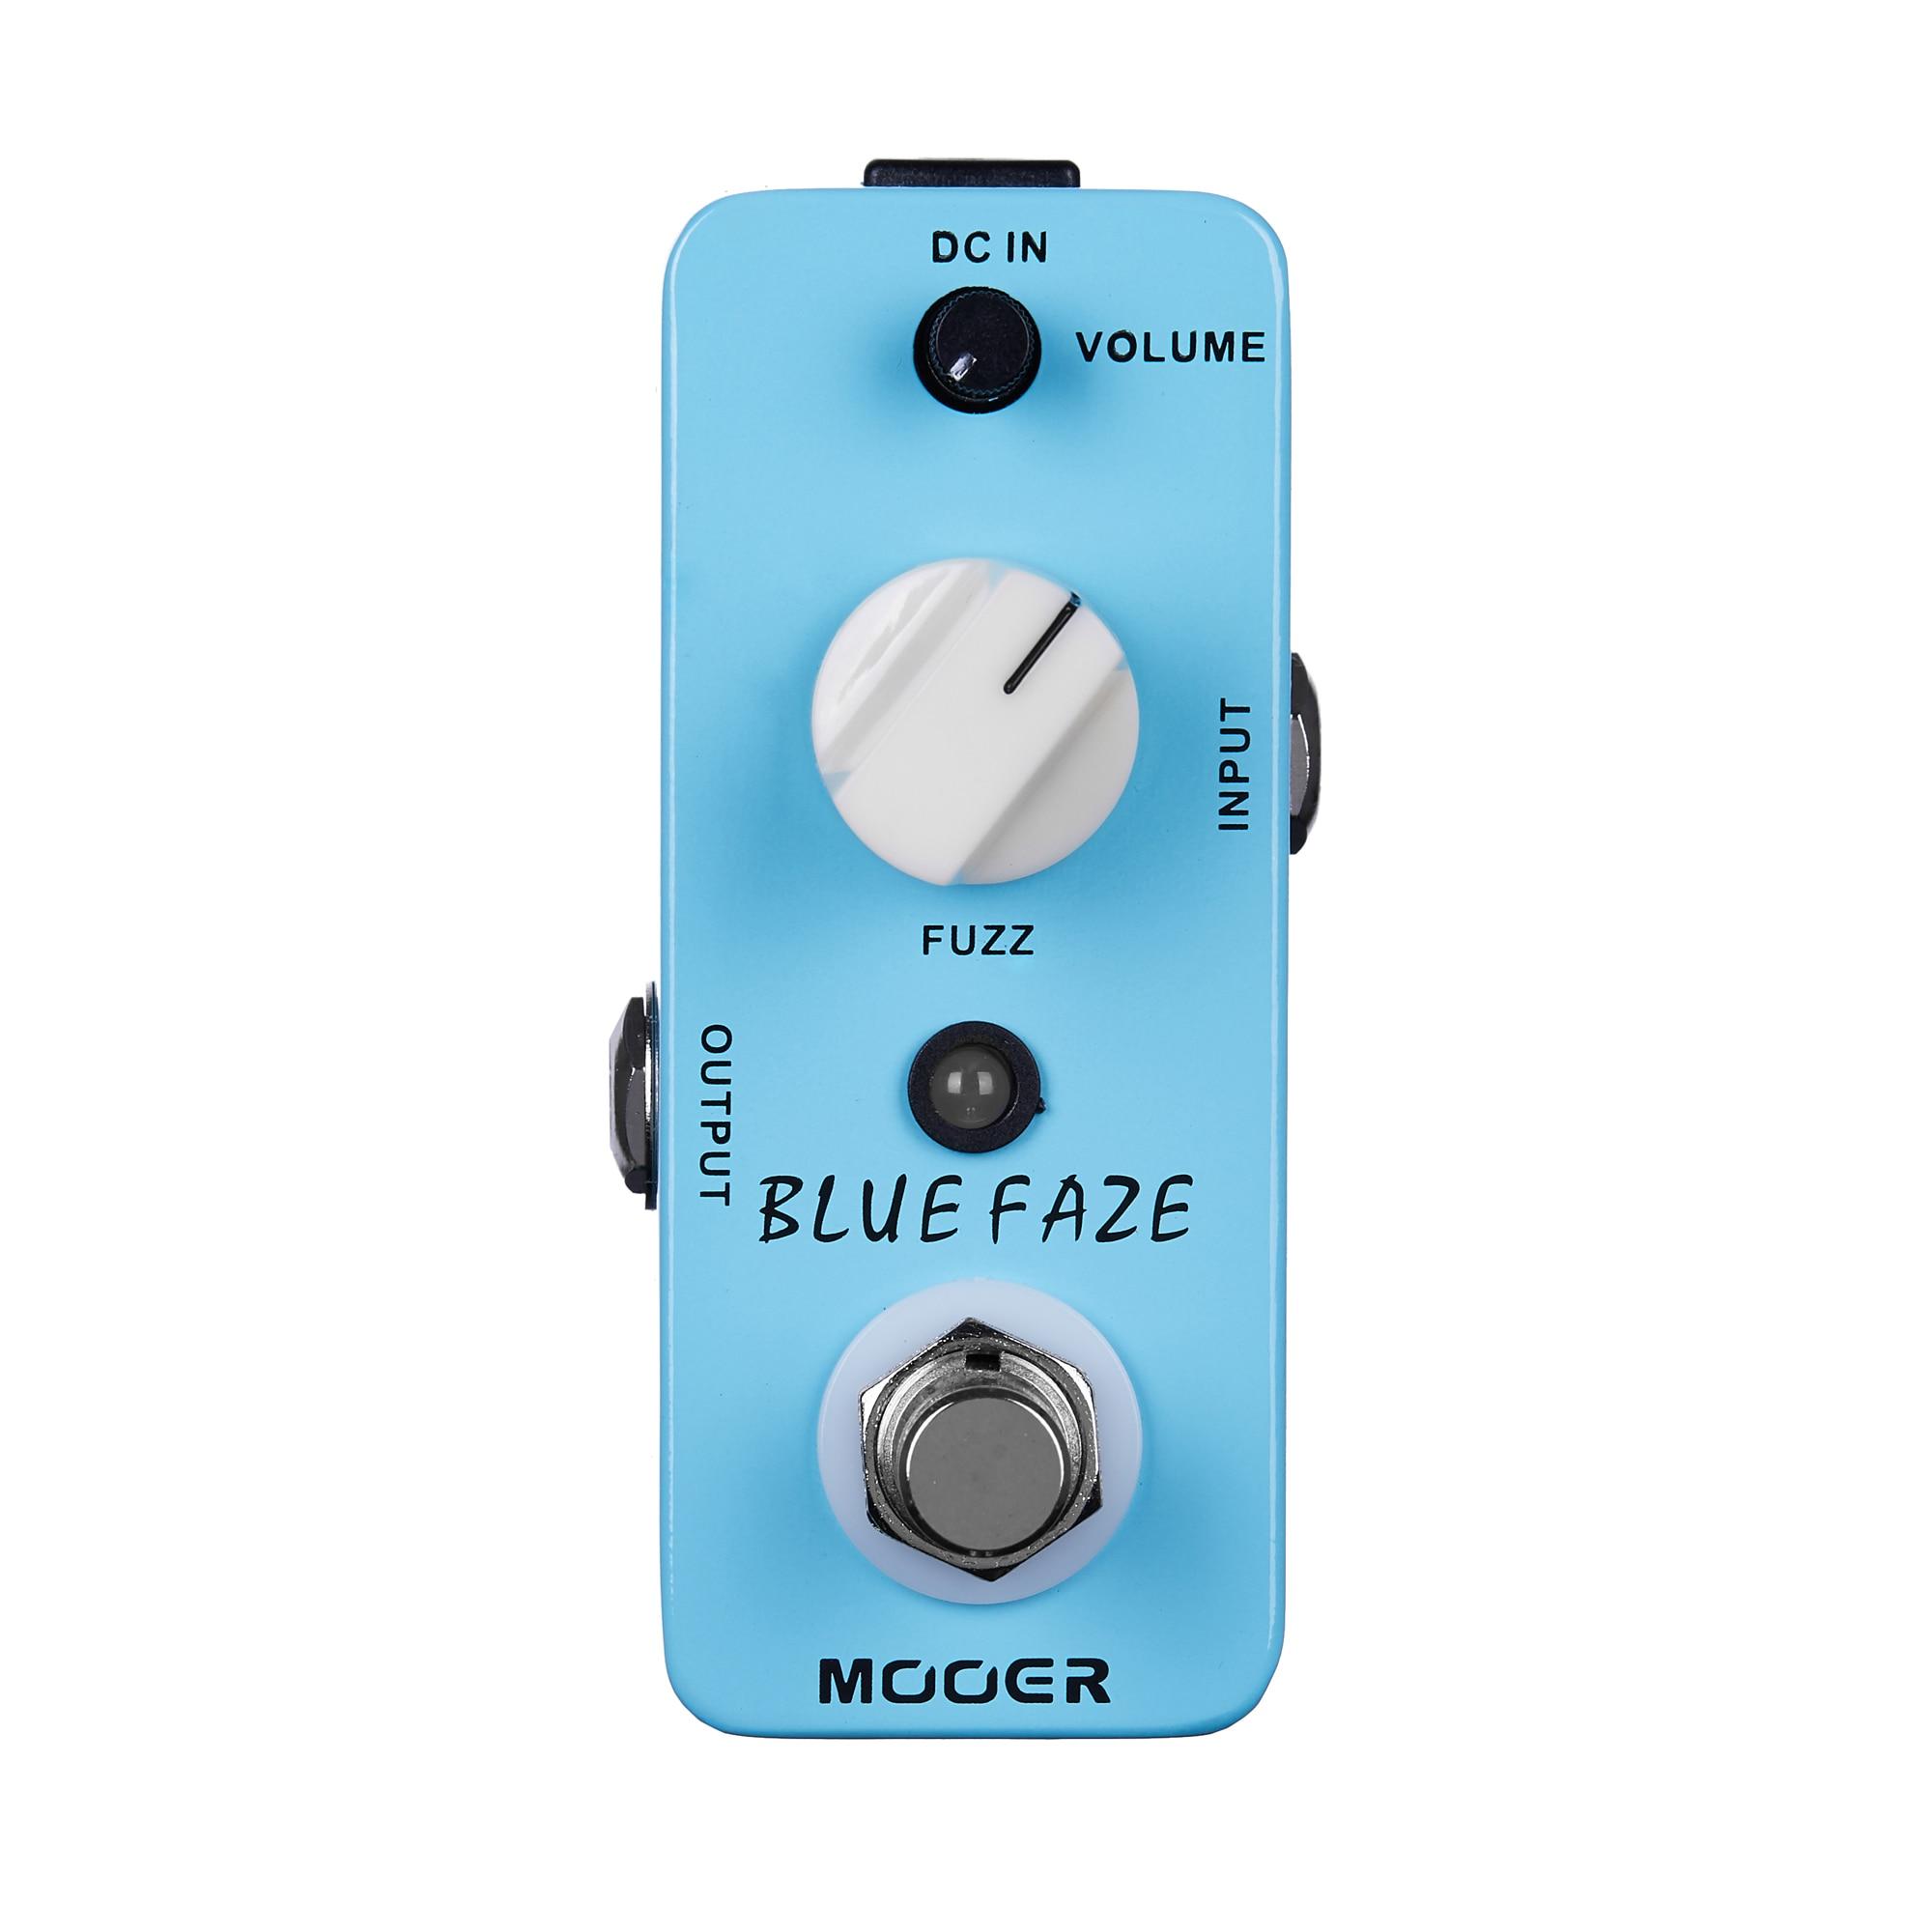 Mooer Blue Faze Fuzz Pedal Electric Guitar Effect Pedal True Bypass MFZ1 mooer blue faze fuzz pedal electric guitar effect pedal true bypass mfz1